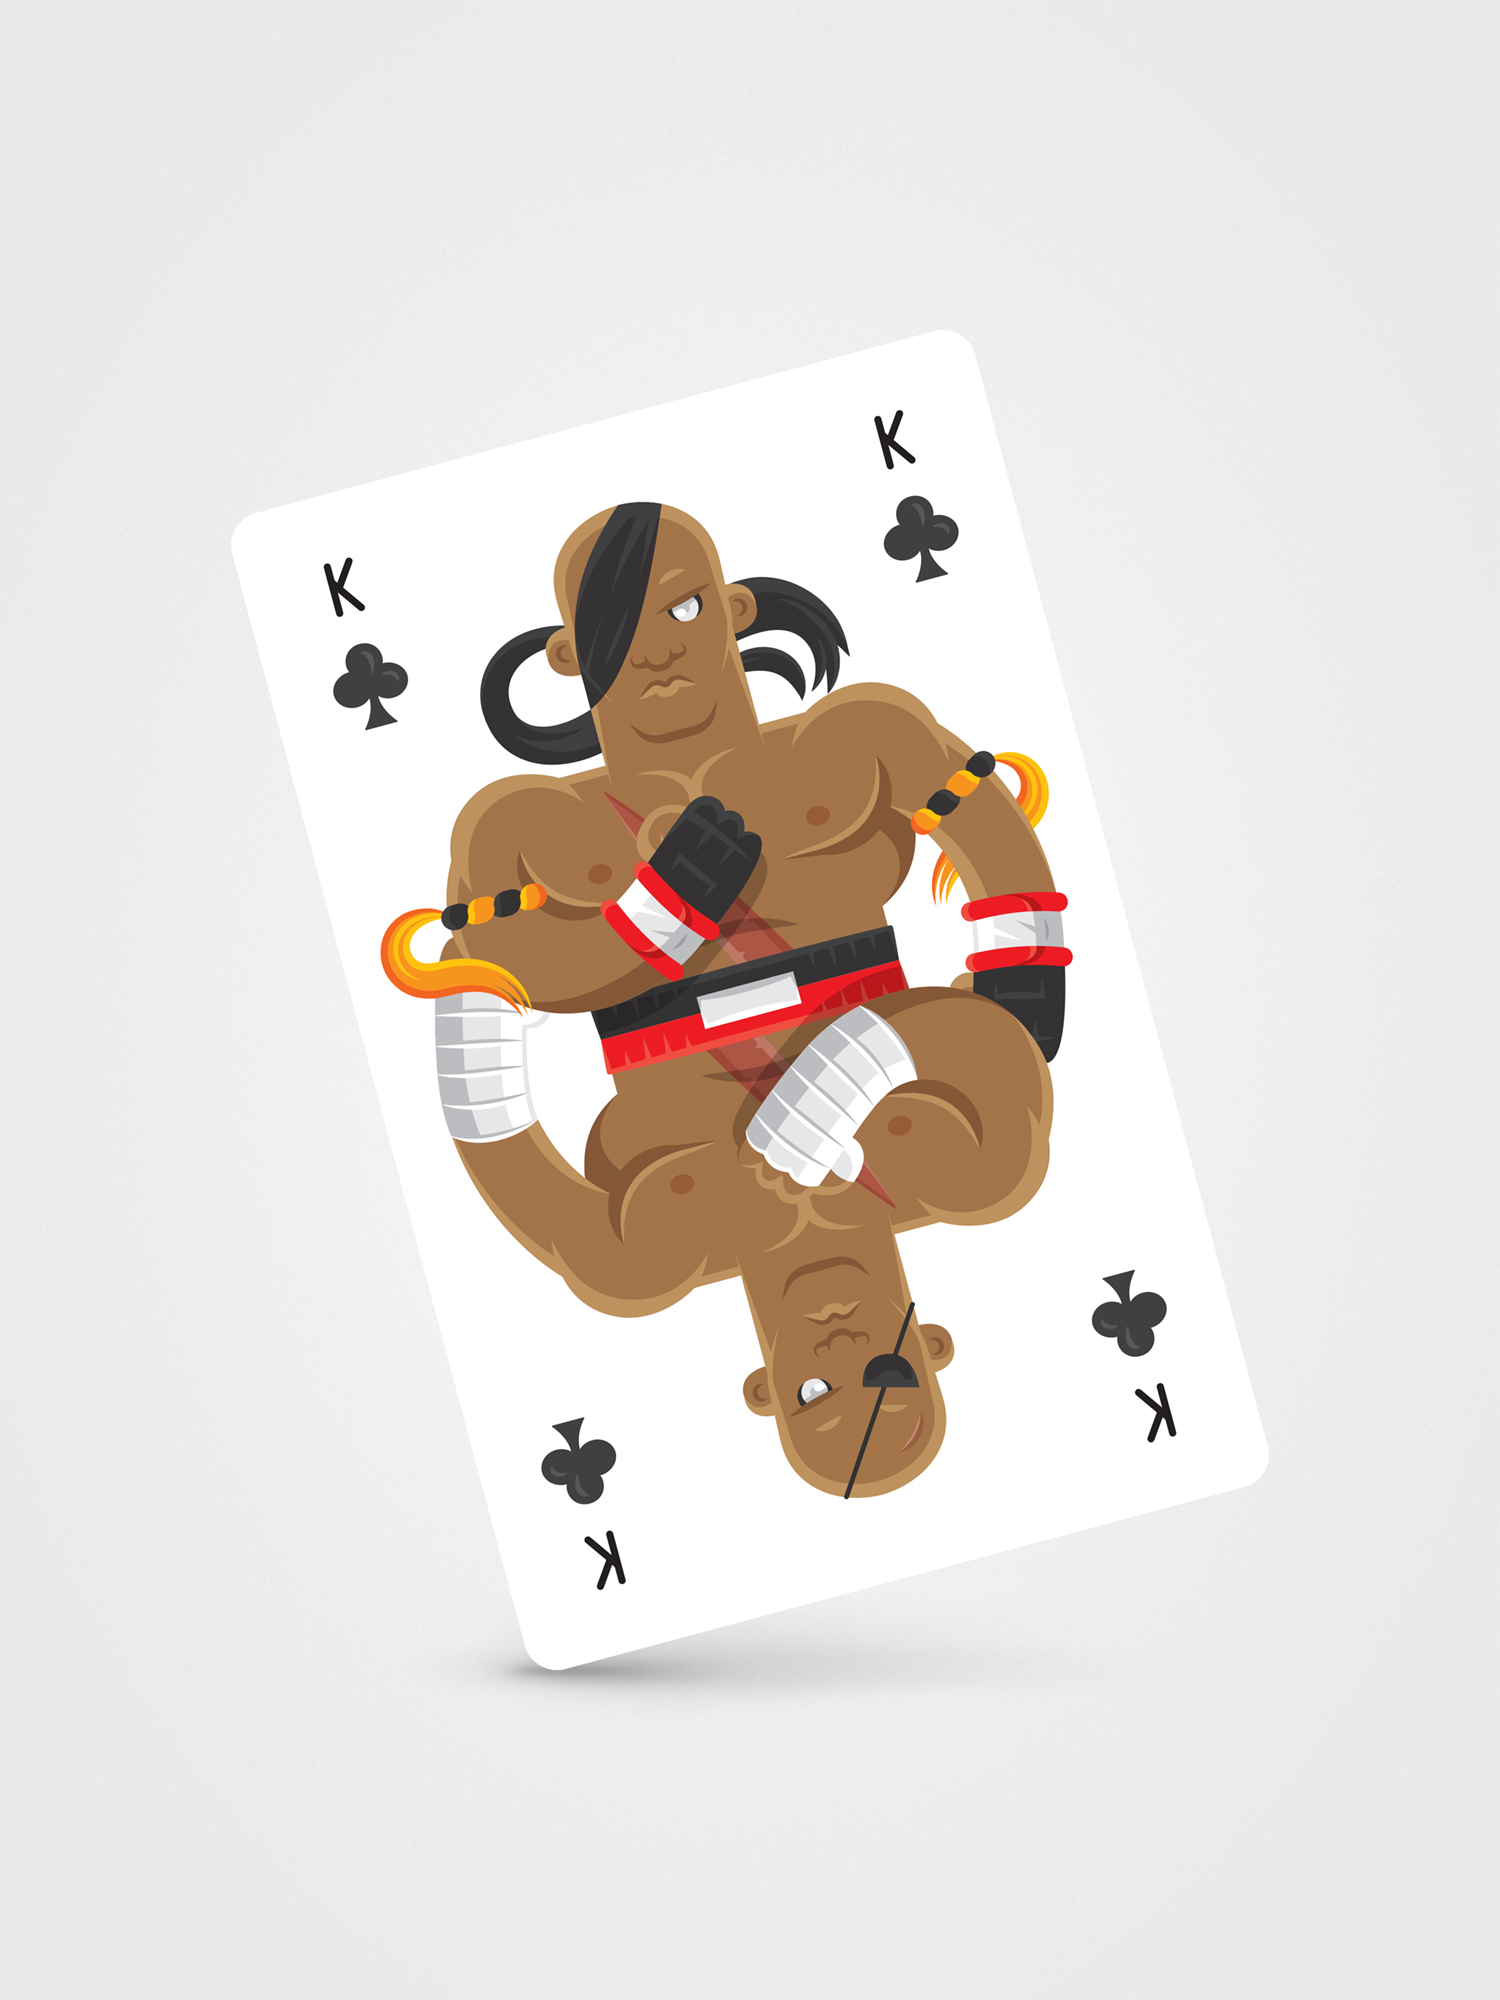 Sagat – King of Clubs